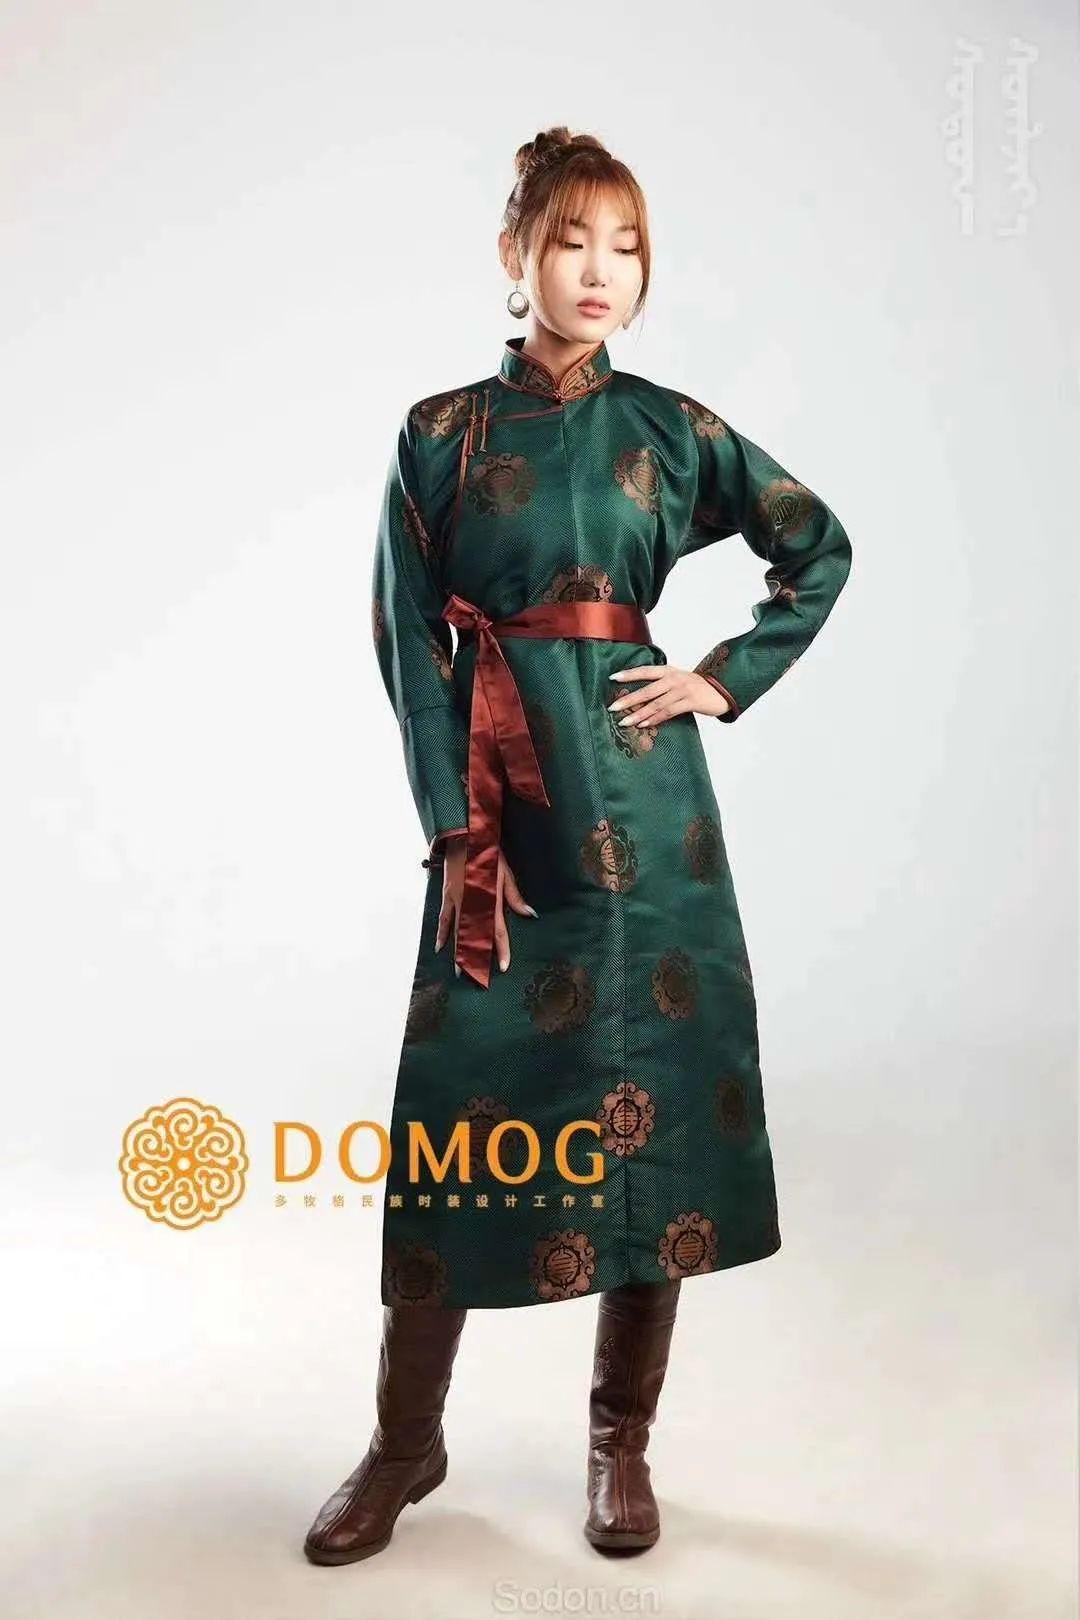 DOMOG 蒙古时装2020新款,民族与时尚的融合 第6张 DOMOG 蒙古时装2020新款,民族与时尚的融合 蒙古服饰